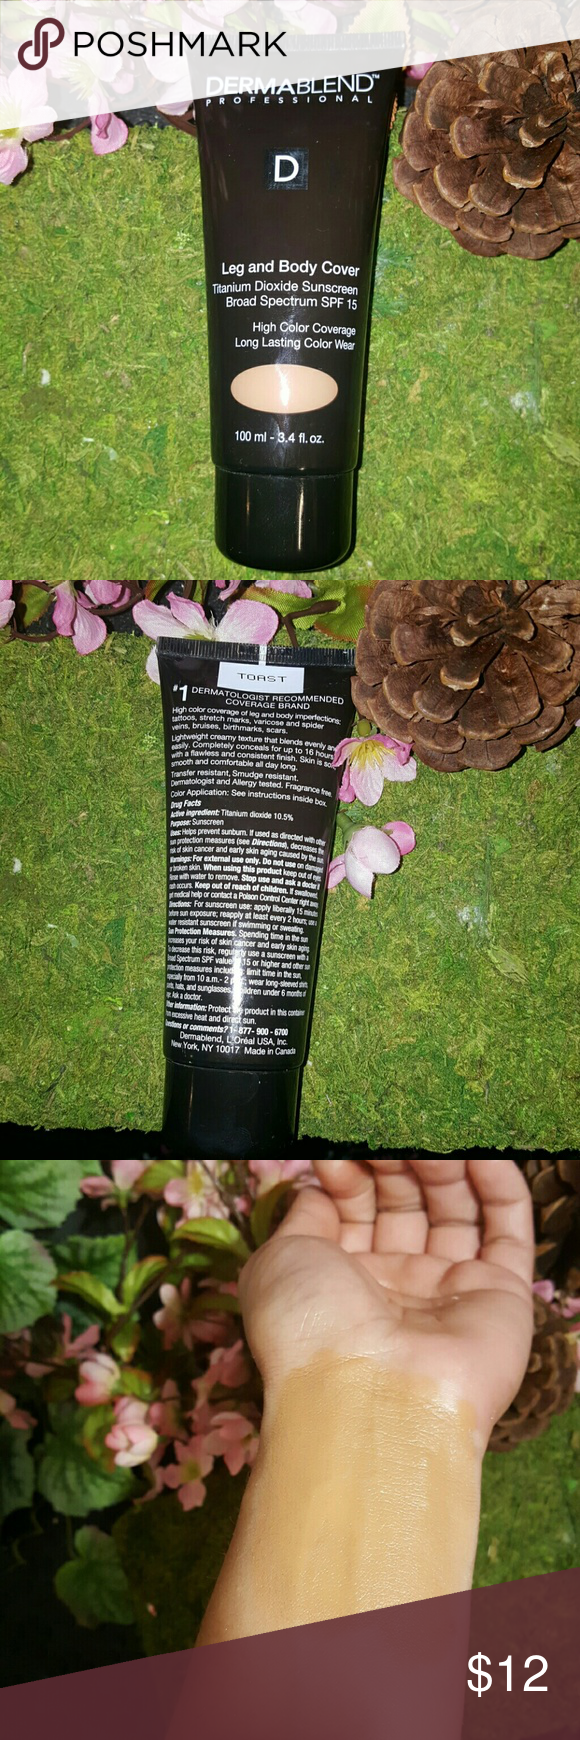 Dermablend leg and Body cover Foundation Dark skin